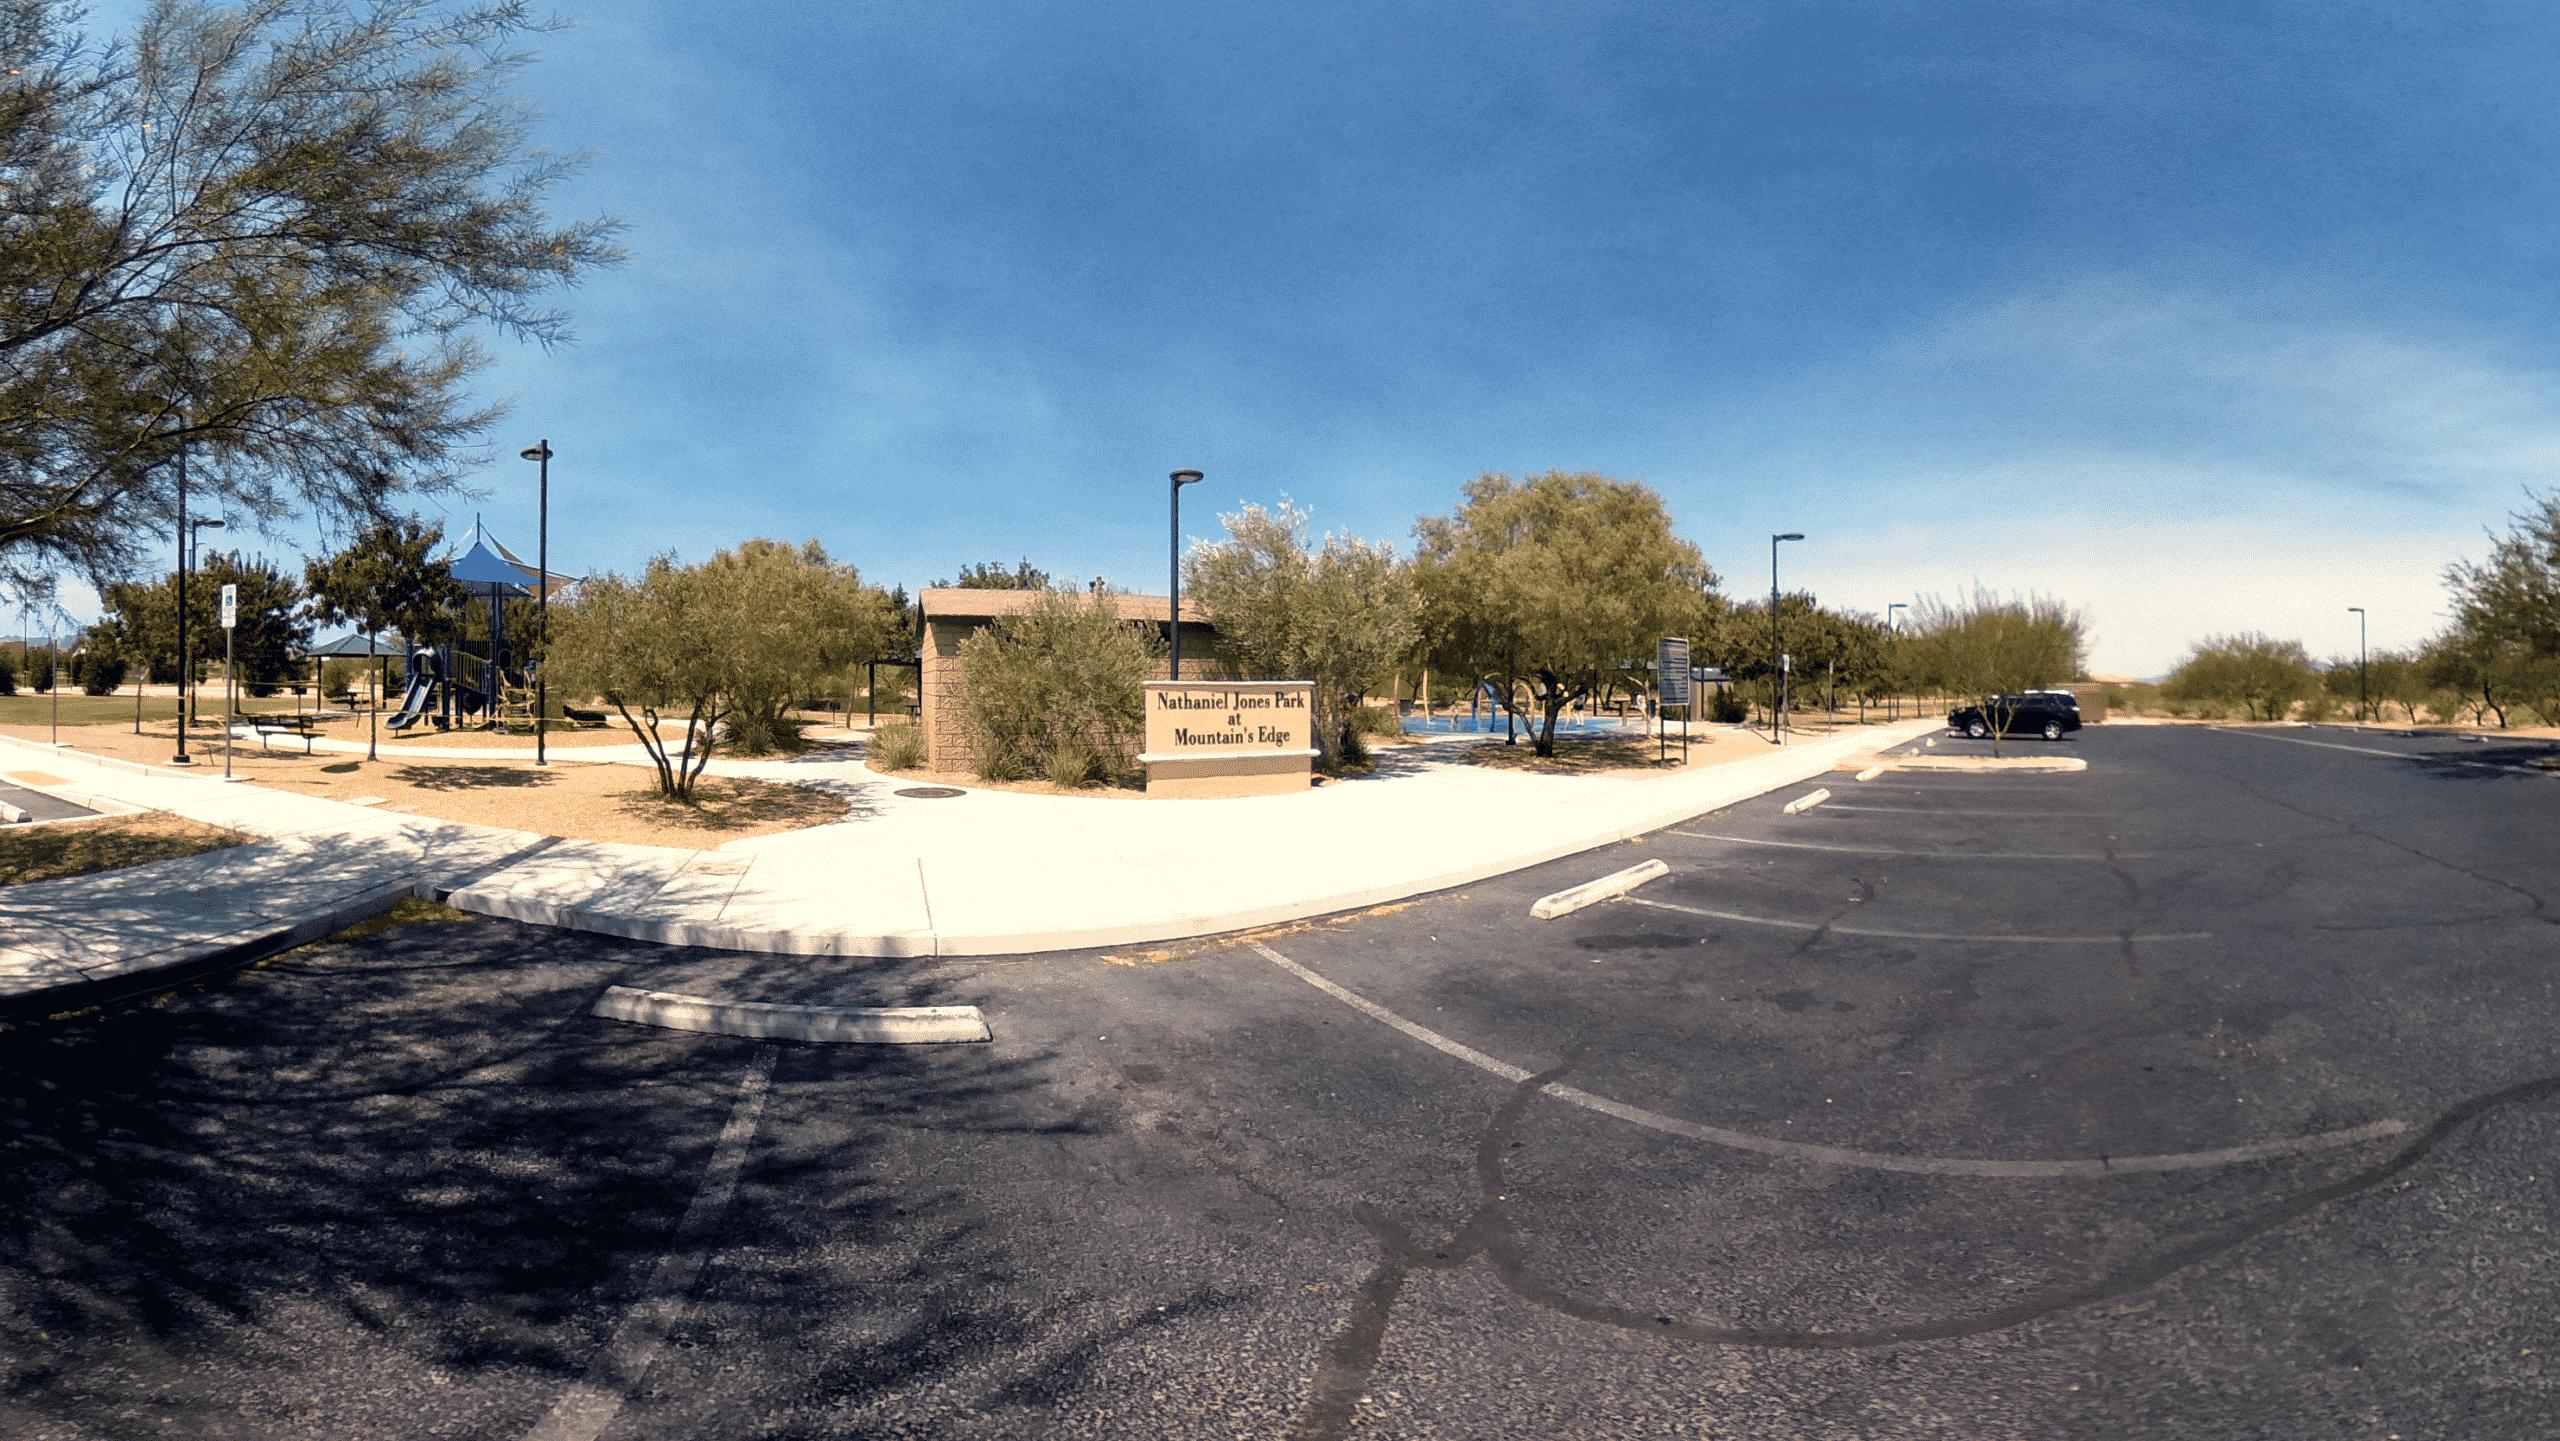 Nathaniel Jones Las Vegas Park